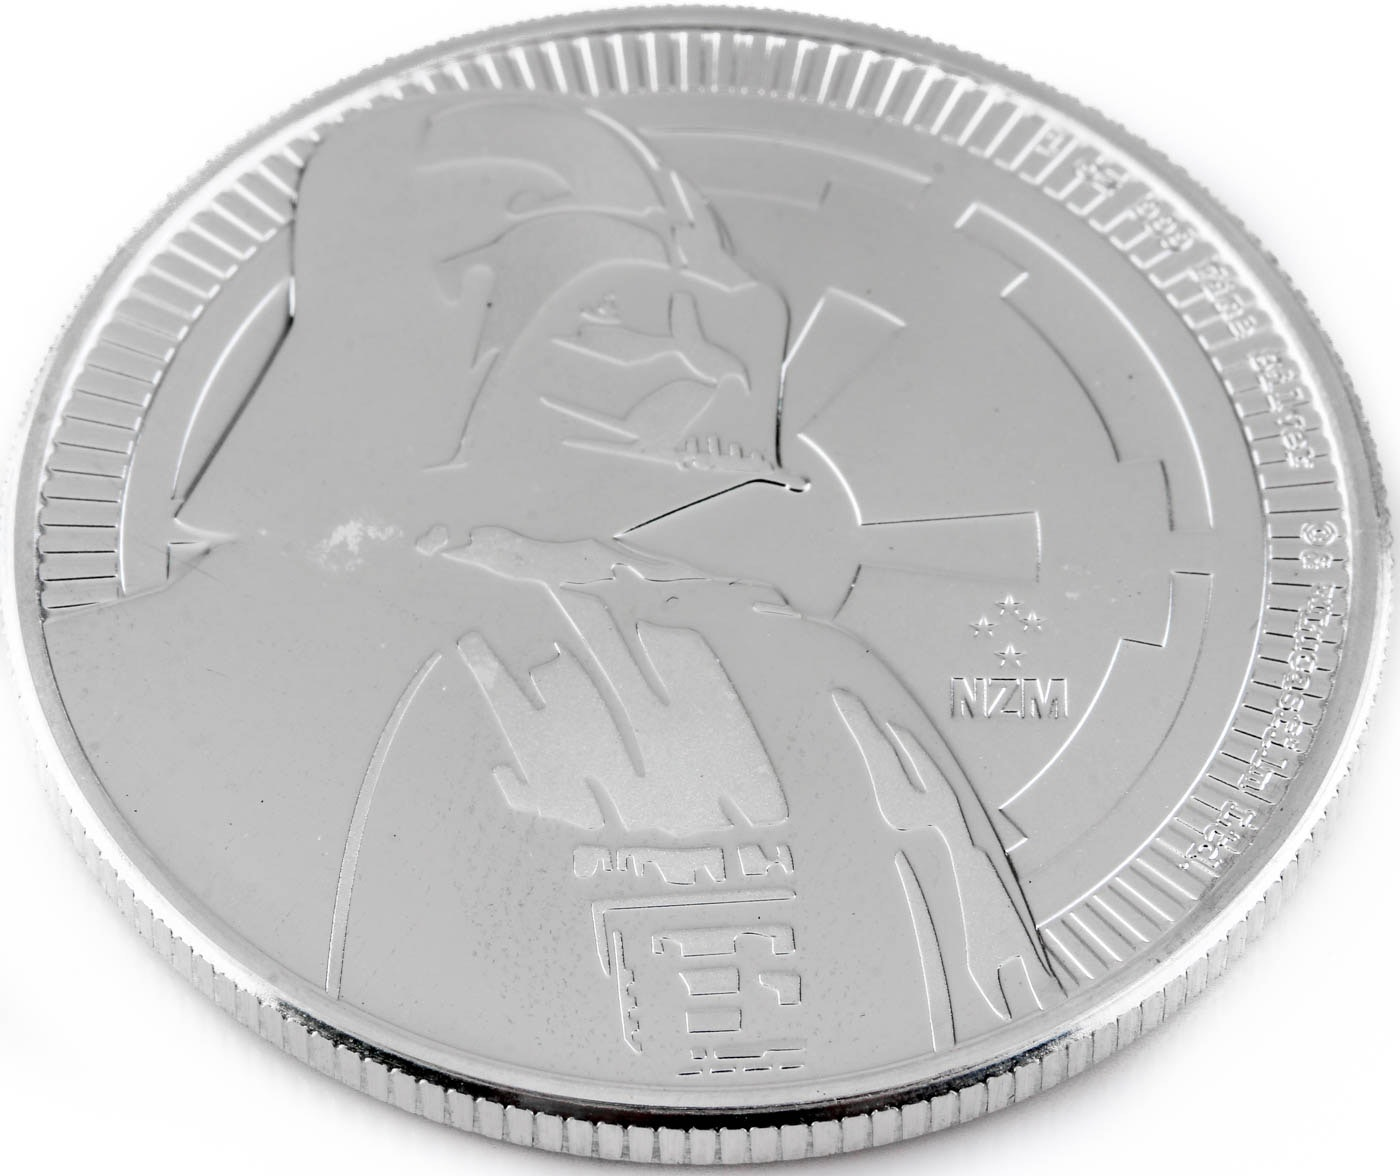 2017 NIUE $2 Silver Darth Vader Coin